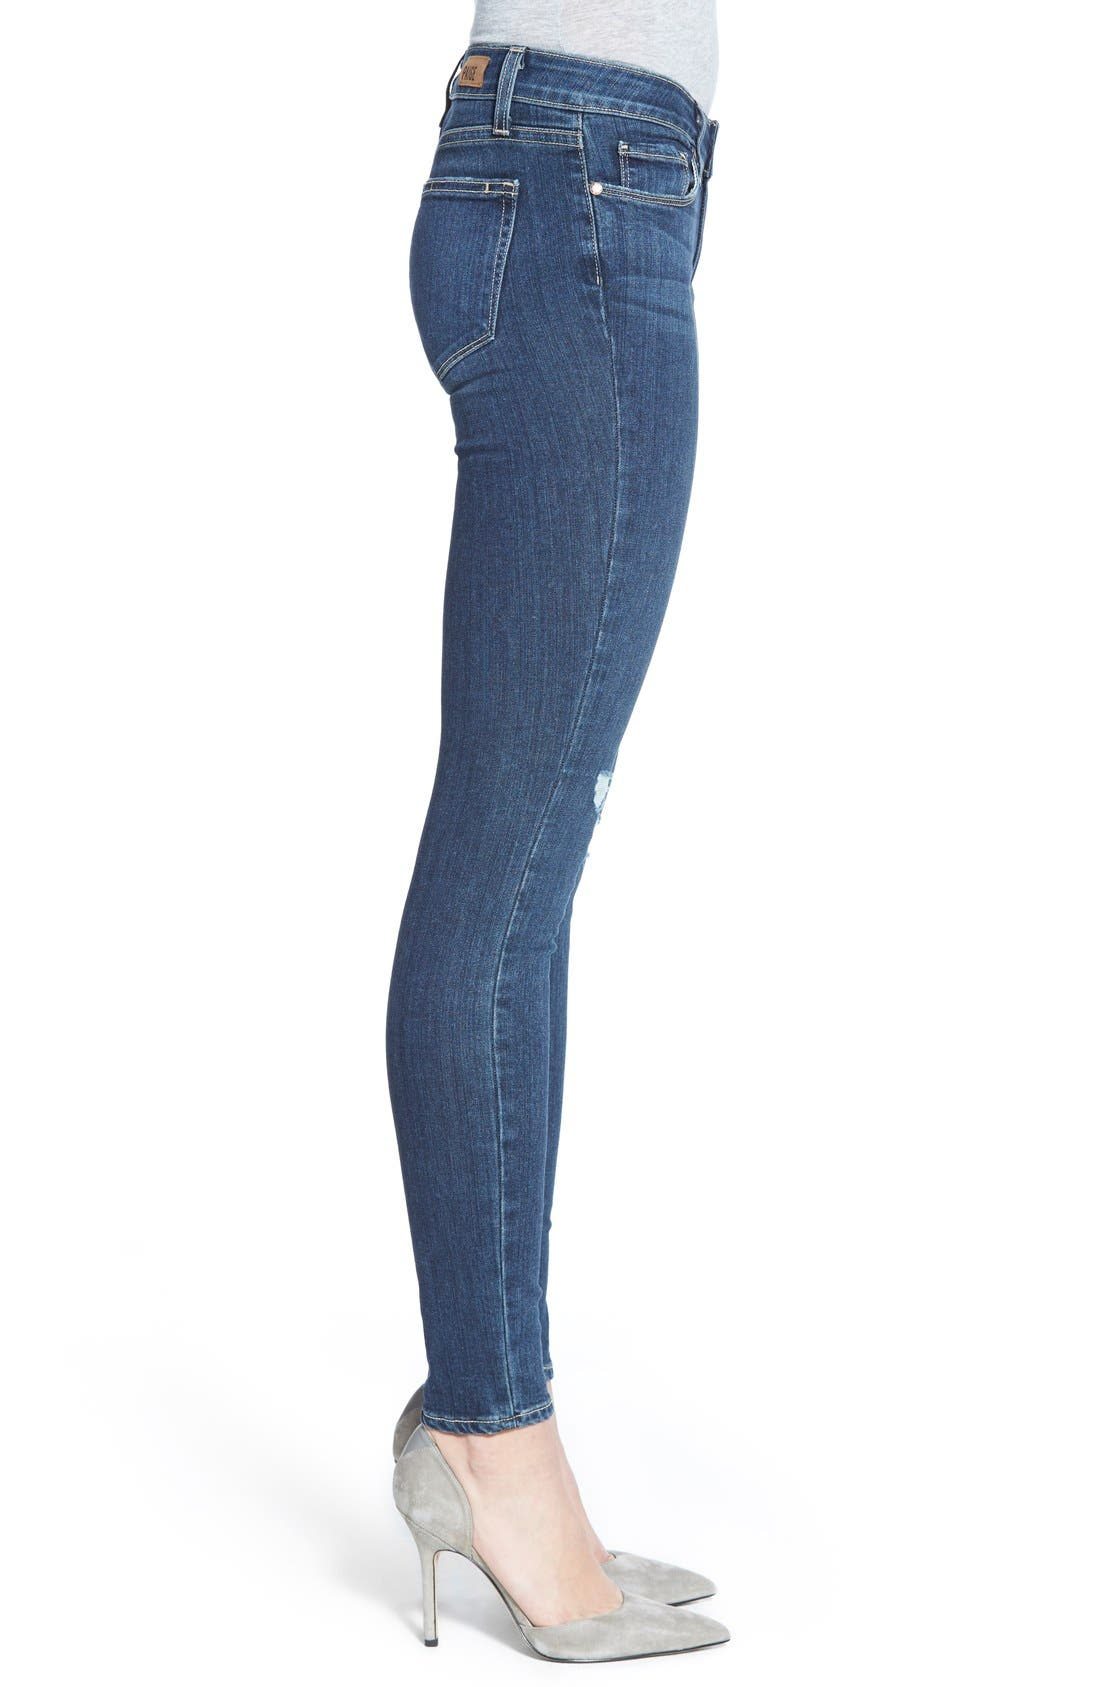 Alternate Image 3  - Paige Denim 'Transcend - Verdugo' Ultra Skinny Jeans (Elia Destructed)